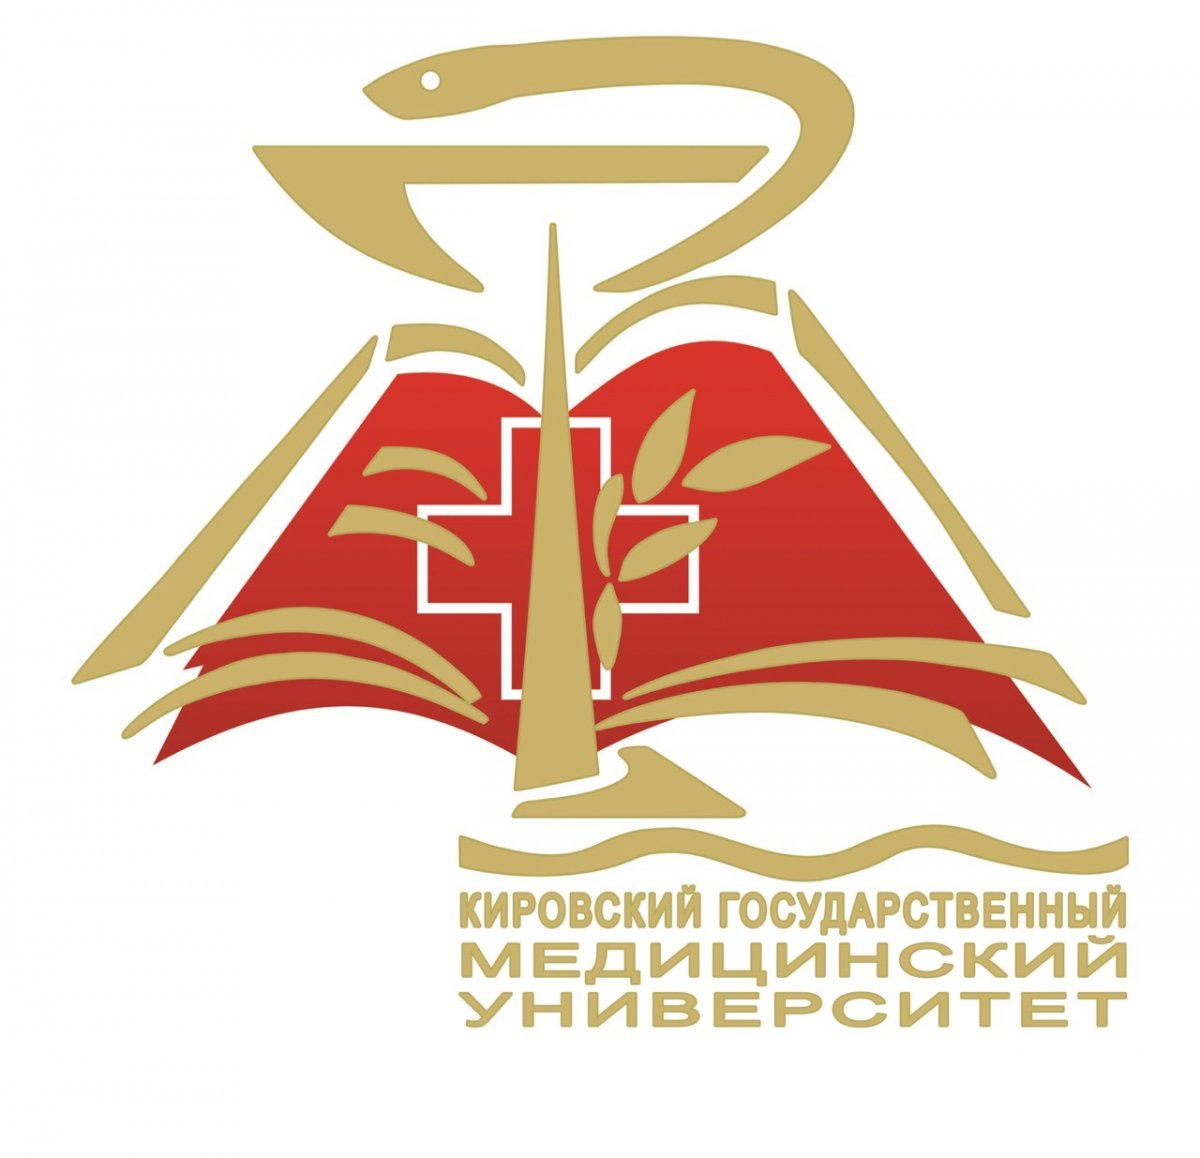 ❗️Встреча администрации университета с обучающимися❗️